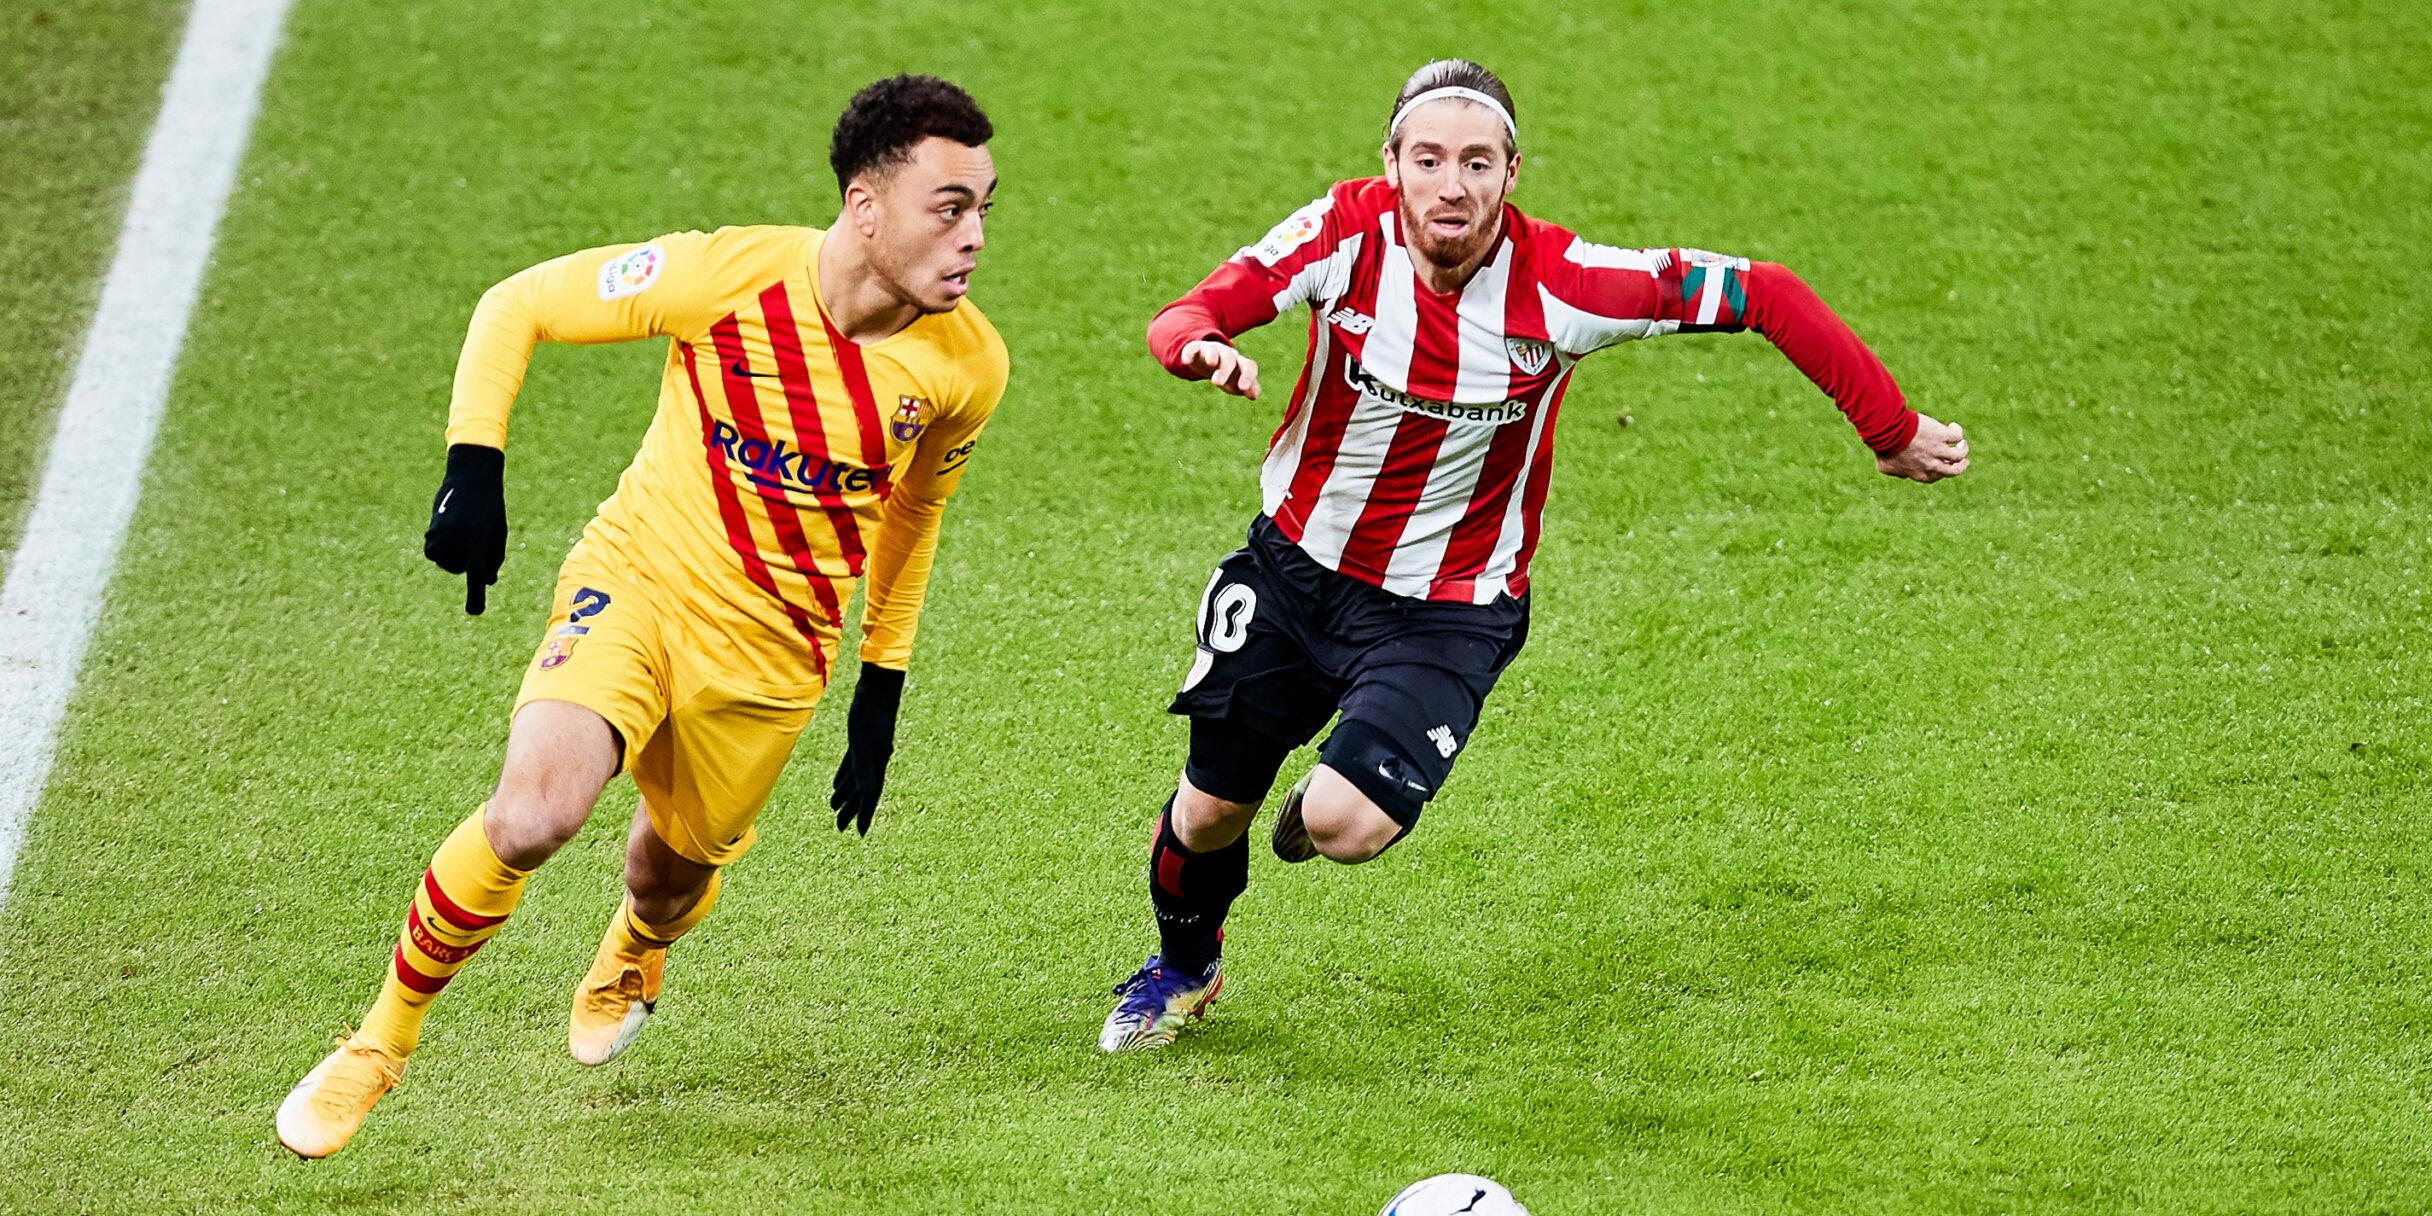 Sergiño Dest, durant un partit del Barça | Europa Press